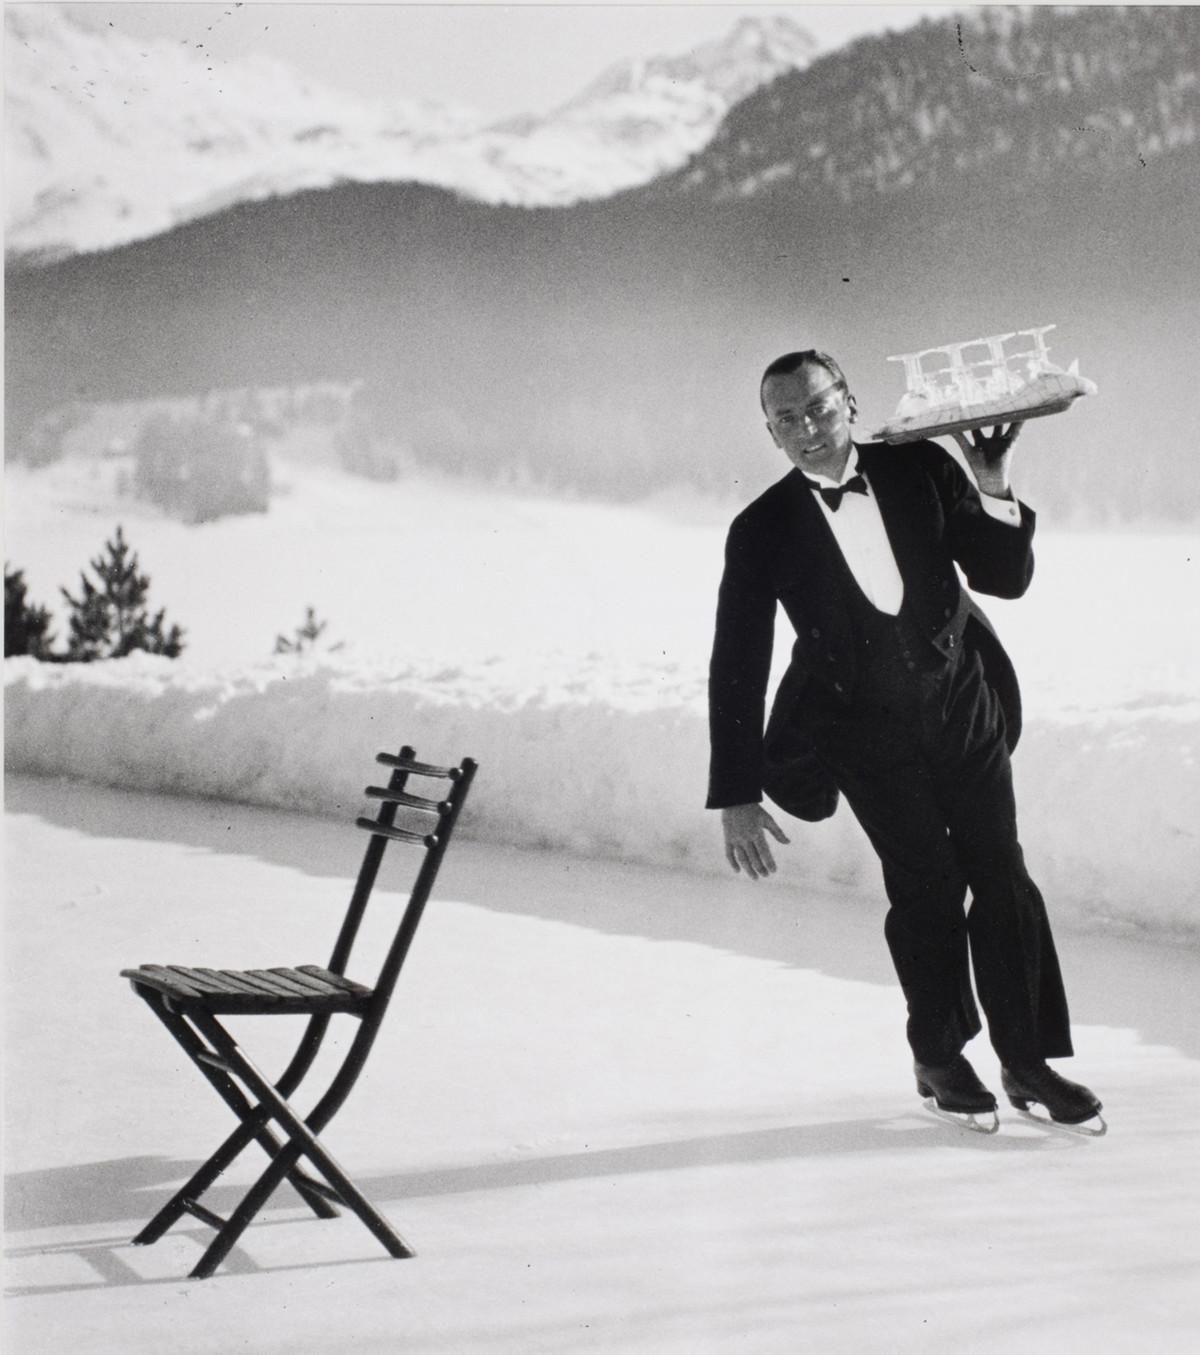 Senior waiter René Breguet from the Grand Hotel serving ice skating cocktails. The commune of St. Moritz in Switzerland, 1932.